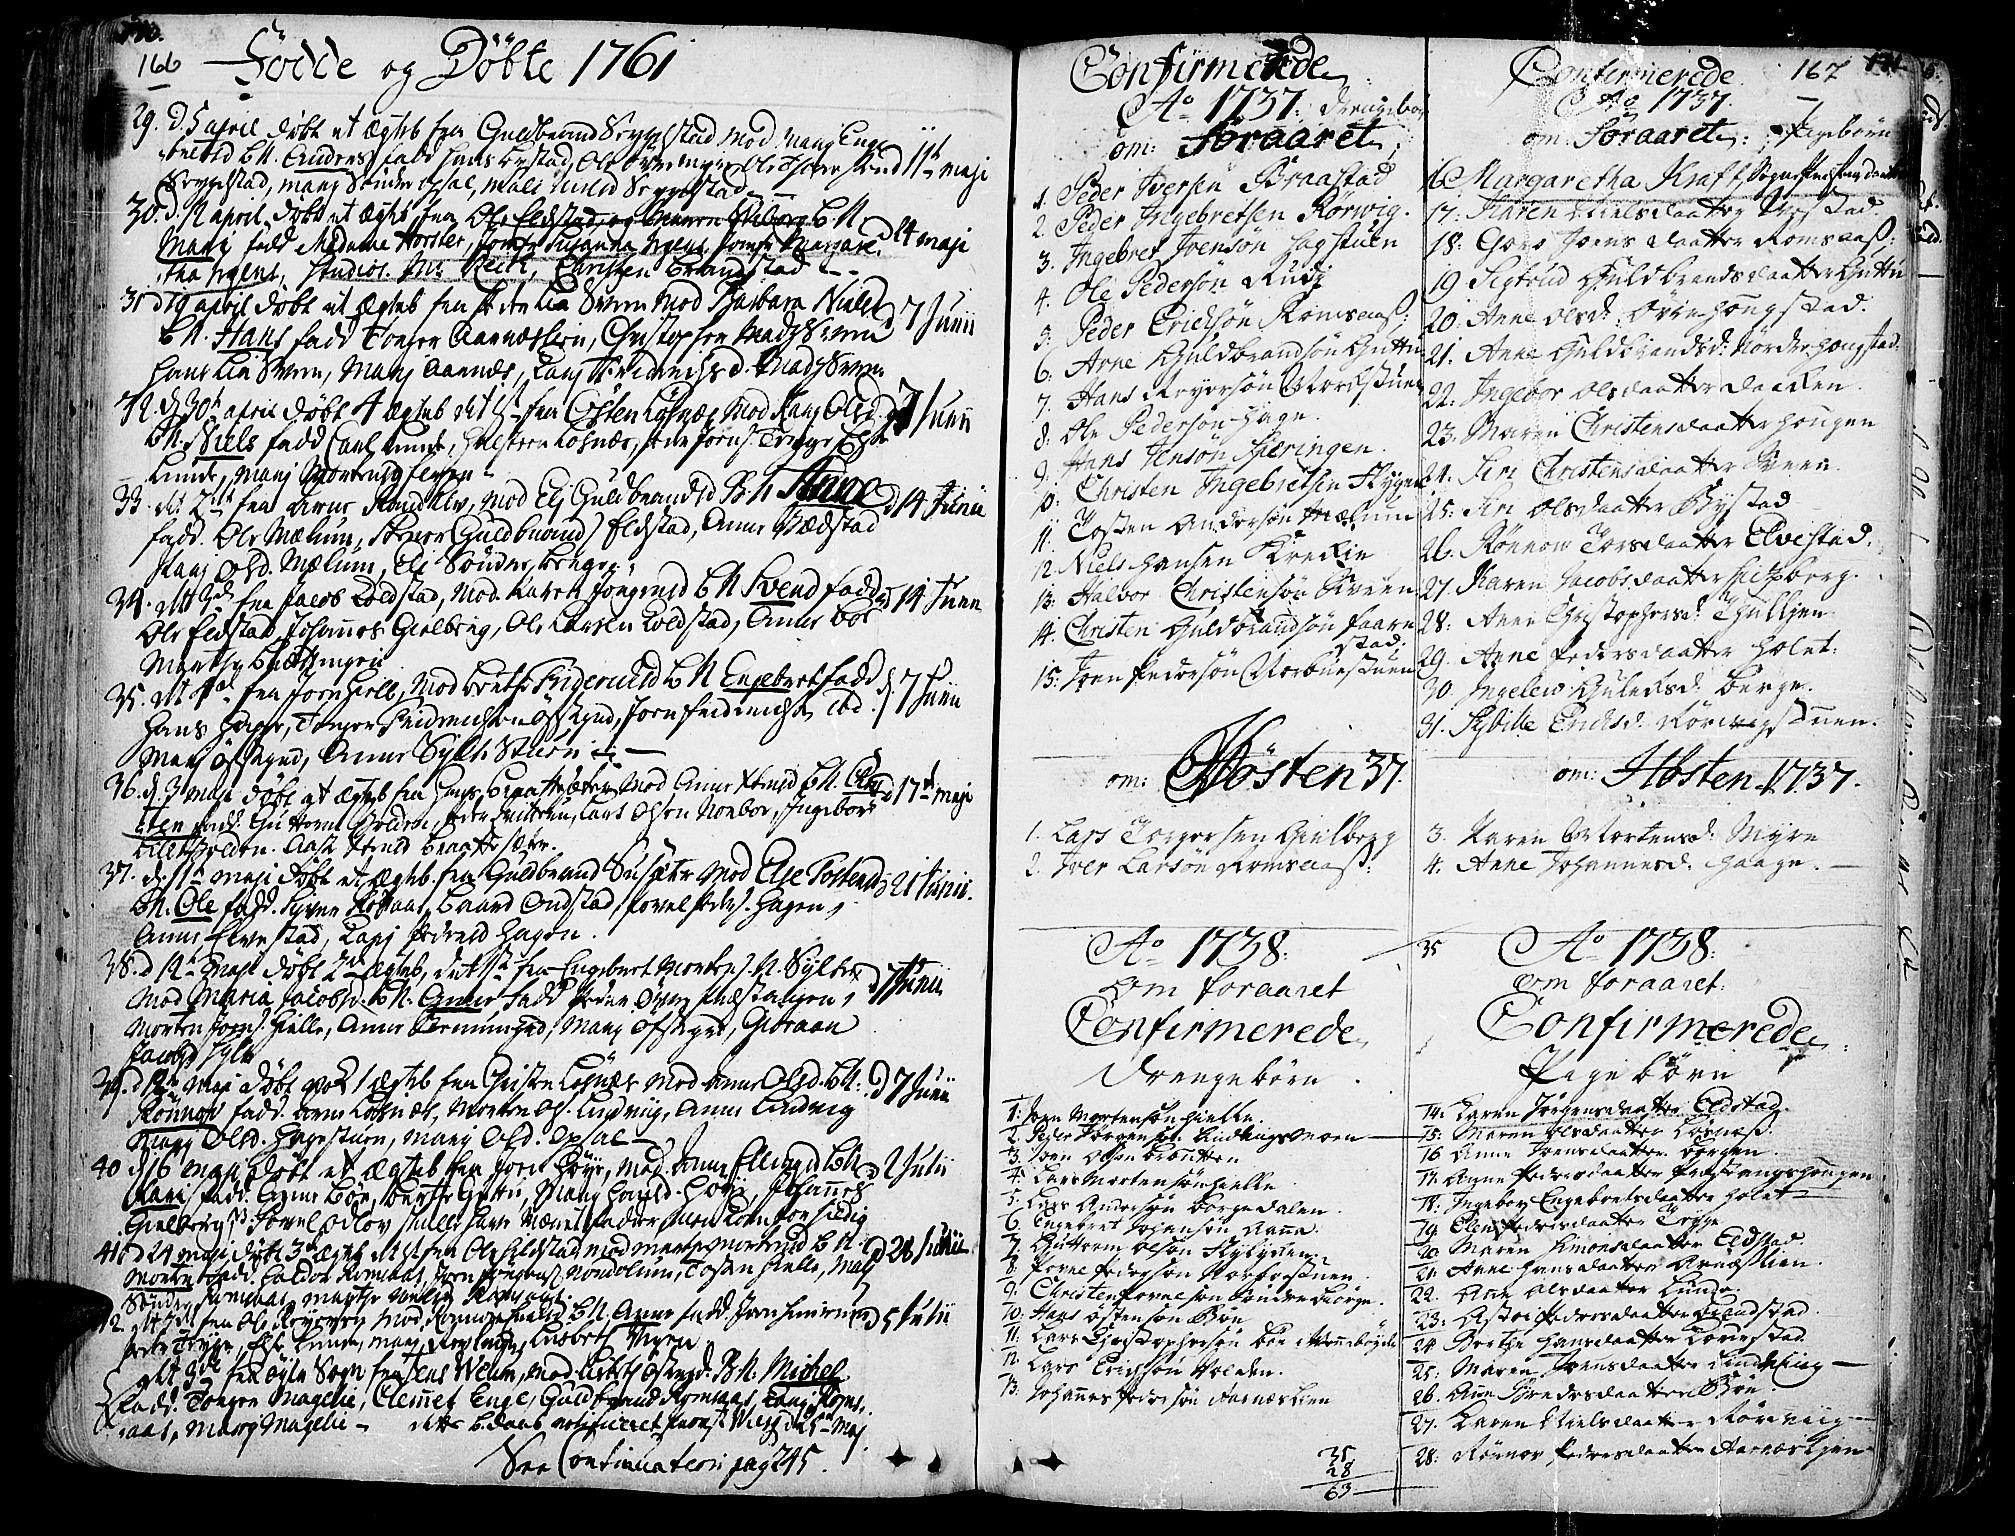 SAH, Ringebu prestekontor, Ministerialbok nr. 2, 1734-1780, s. 166-167